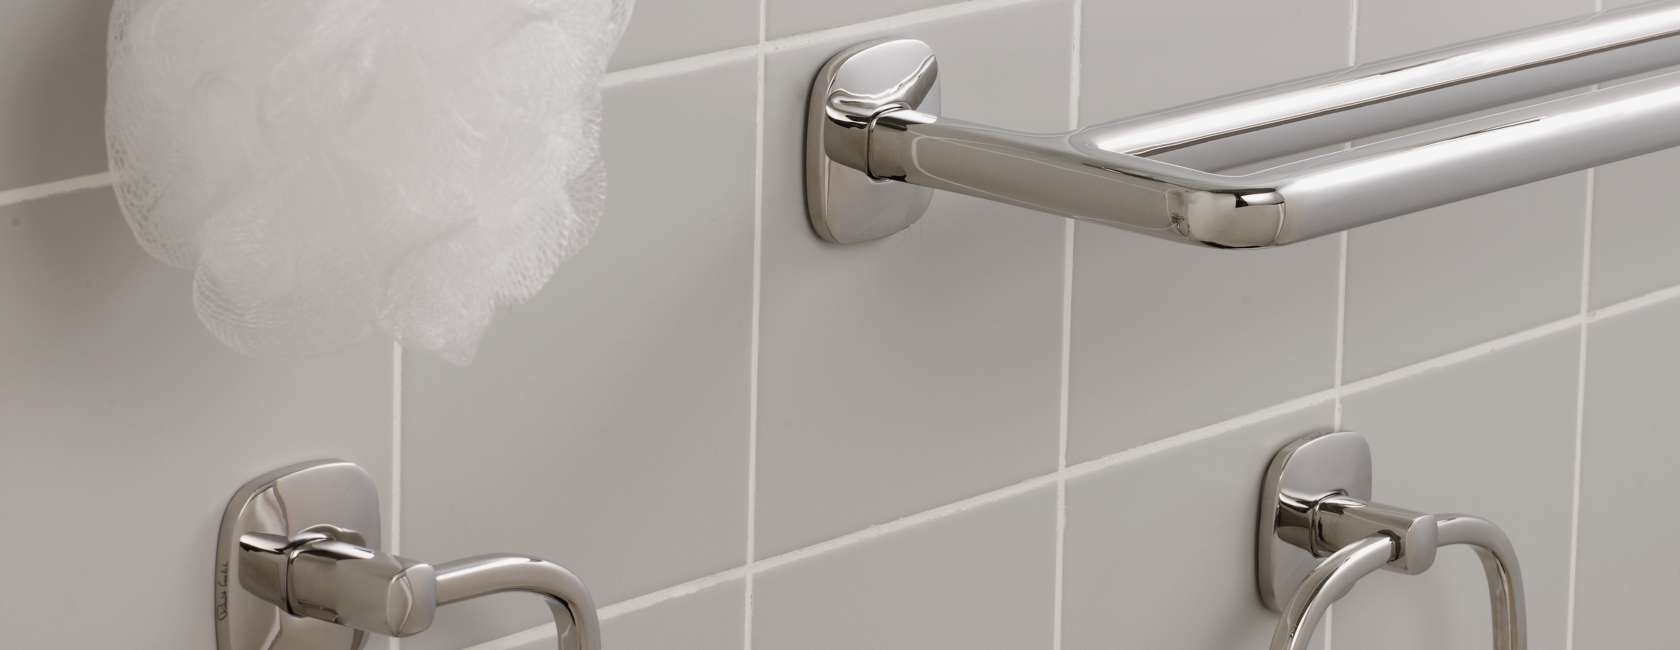 Robert Welch Burford Bathroom Ing Range